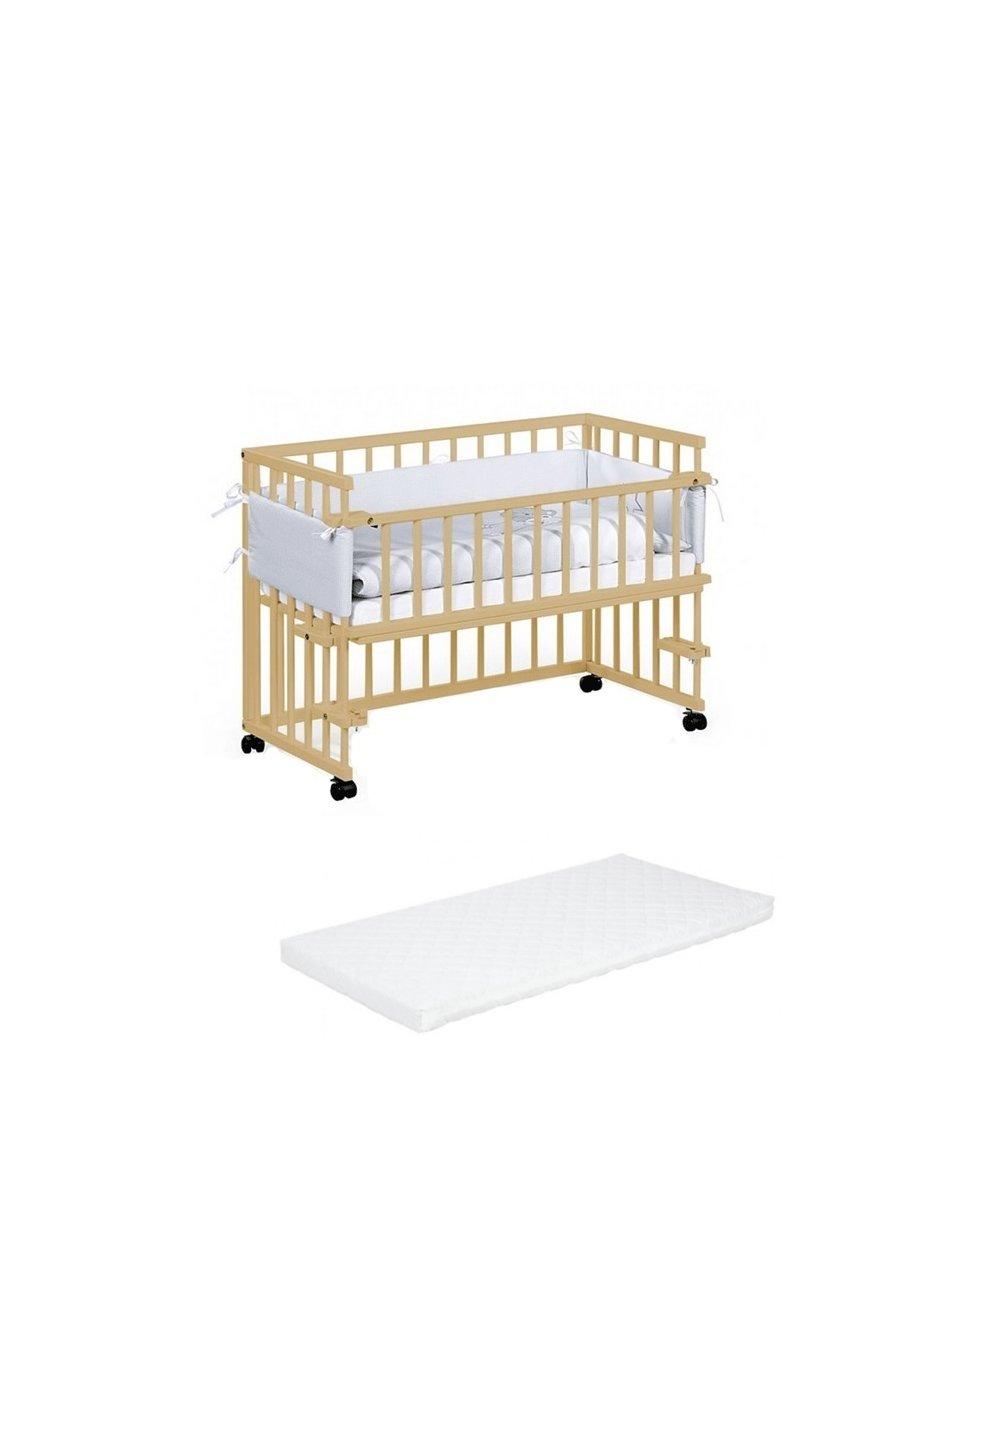 Patut bebe lemn, Piccolo, pin, 95x45 cm + Saltea patut, Picolo,90x45 cm imagine